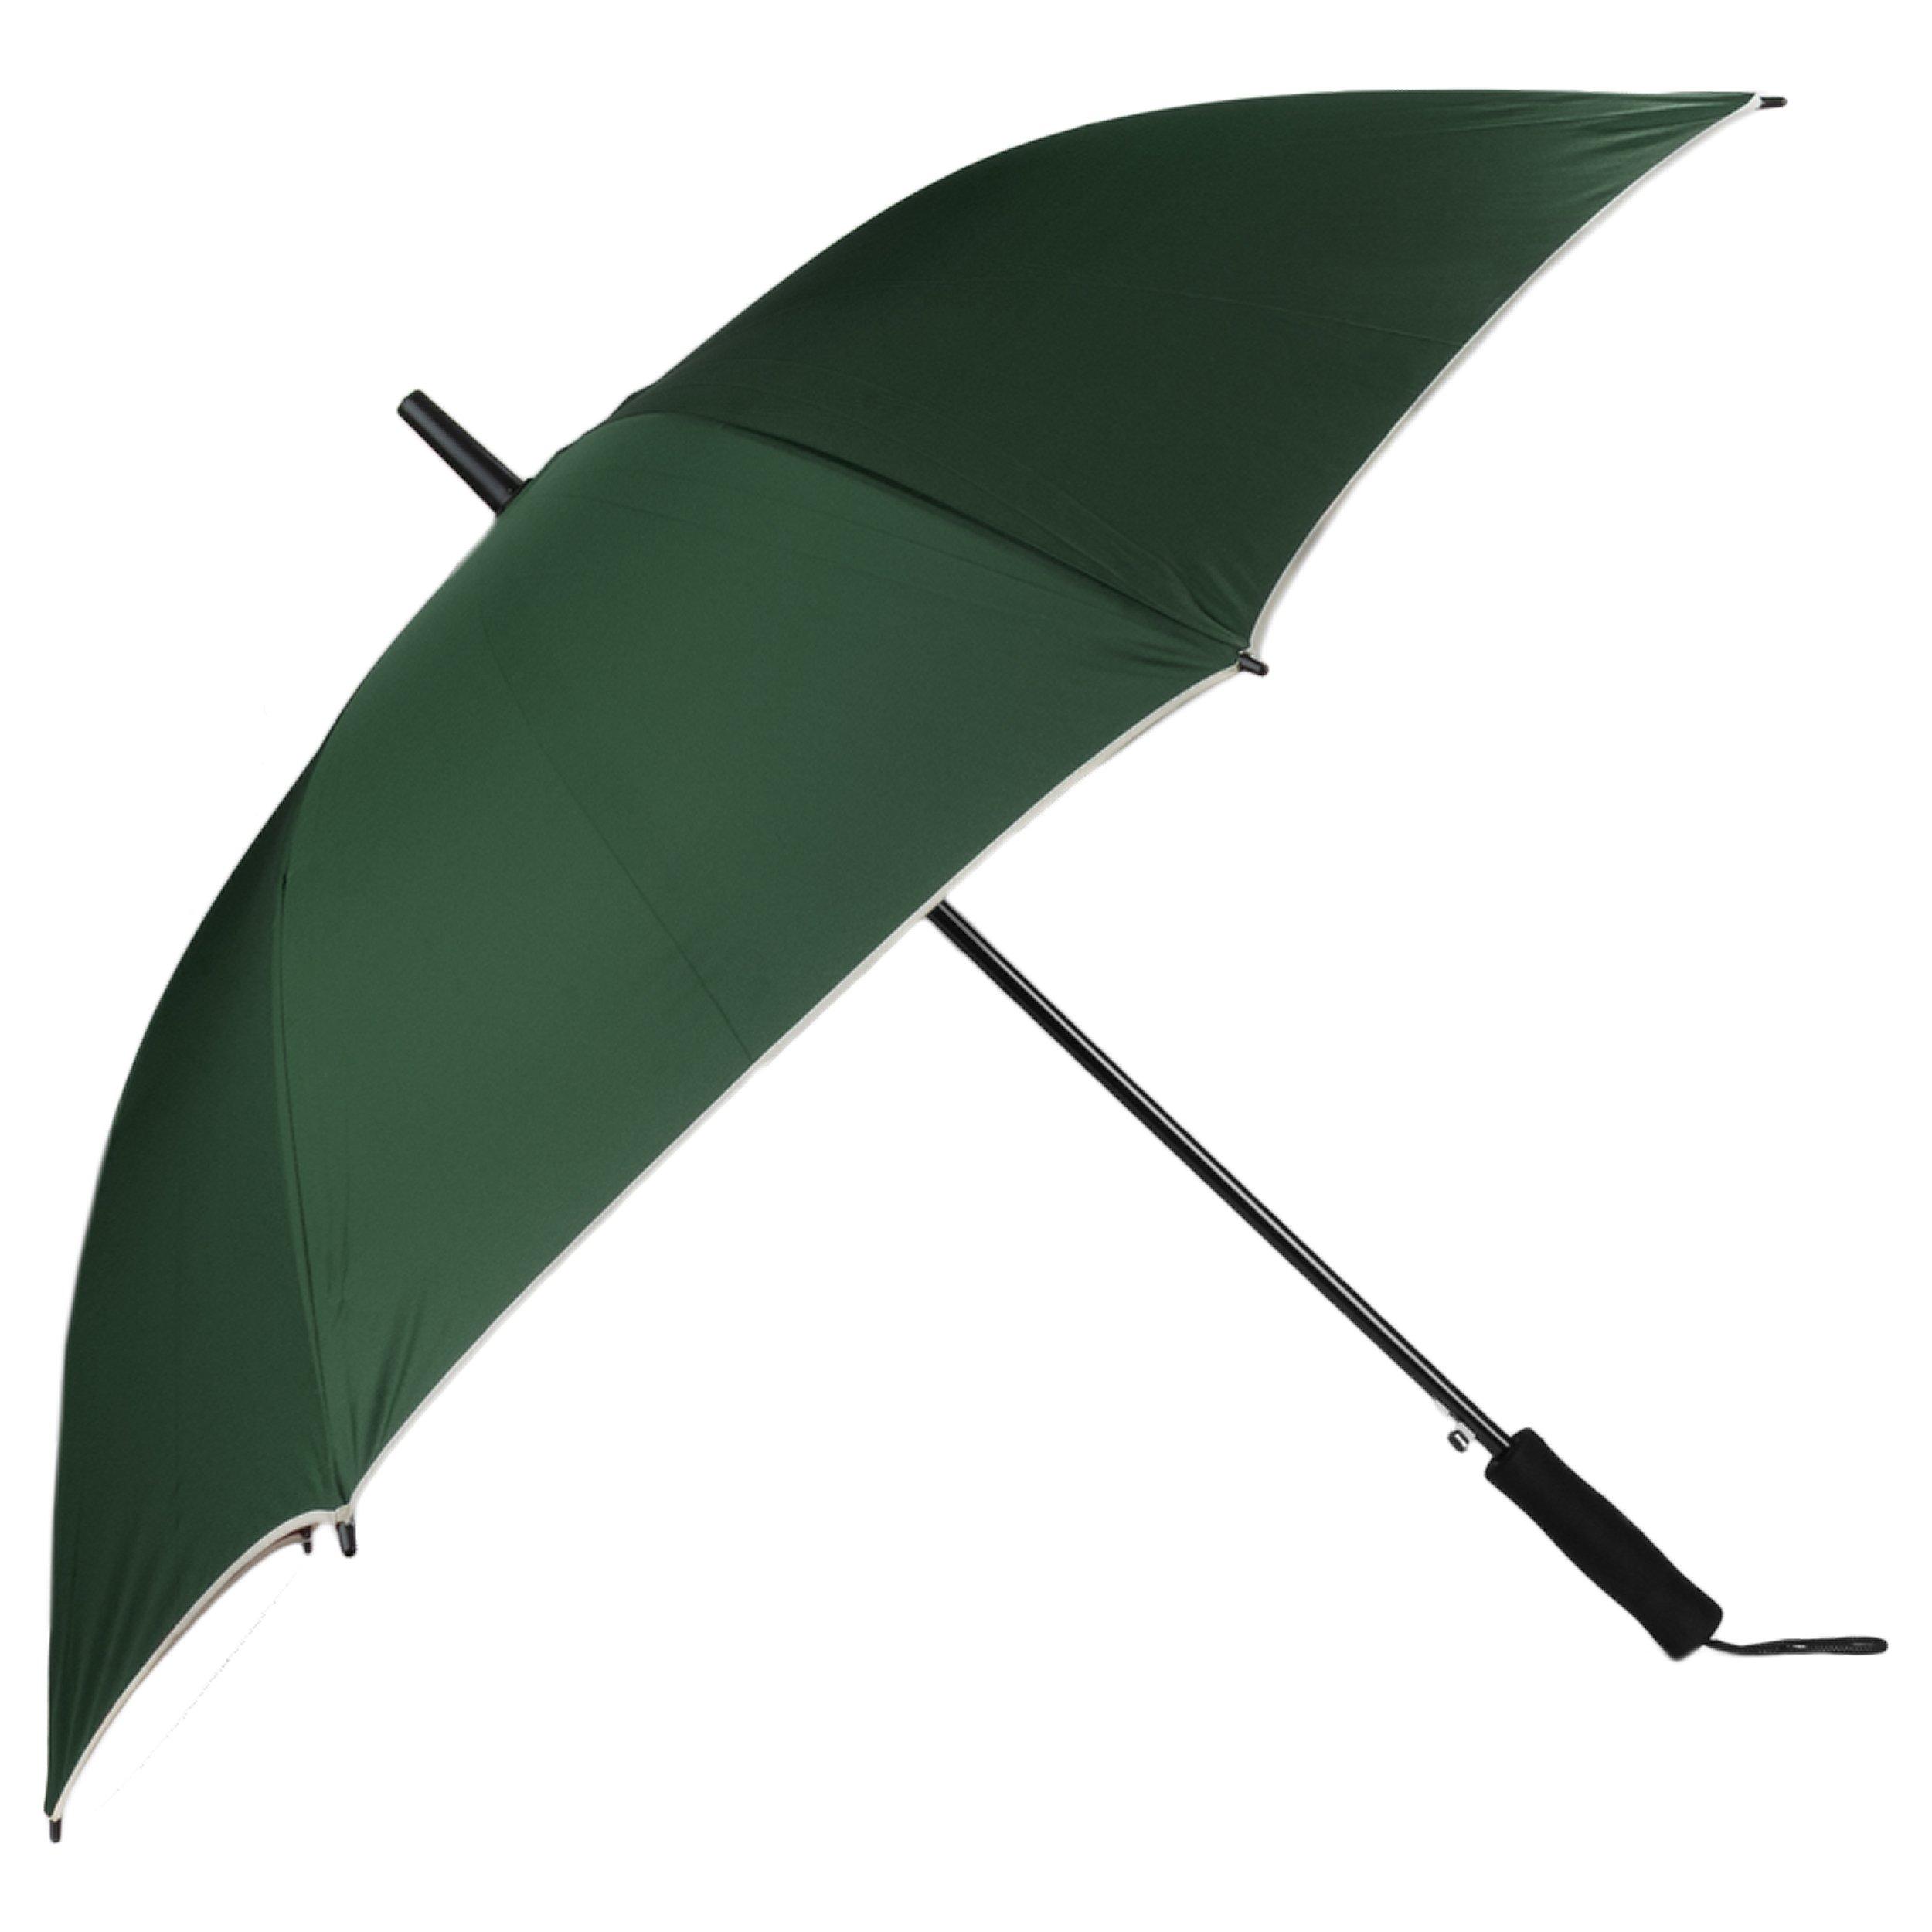 Aerusi Polyester Beige Trim Automatic 8 Framed Travel Long Umbrella, Green